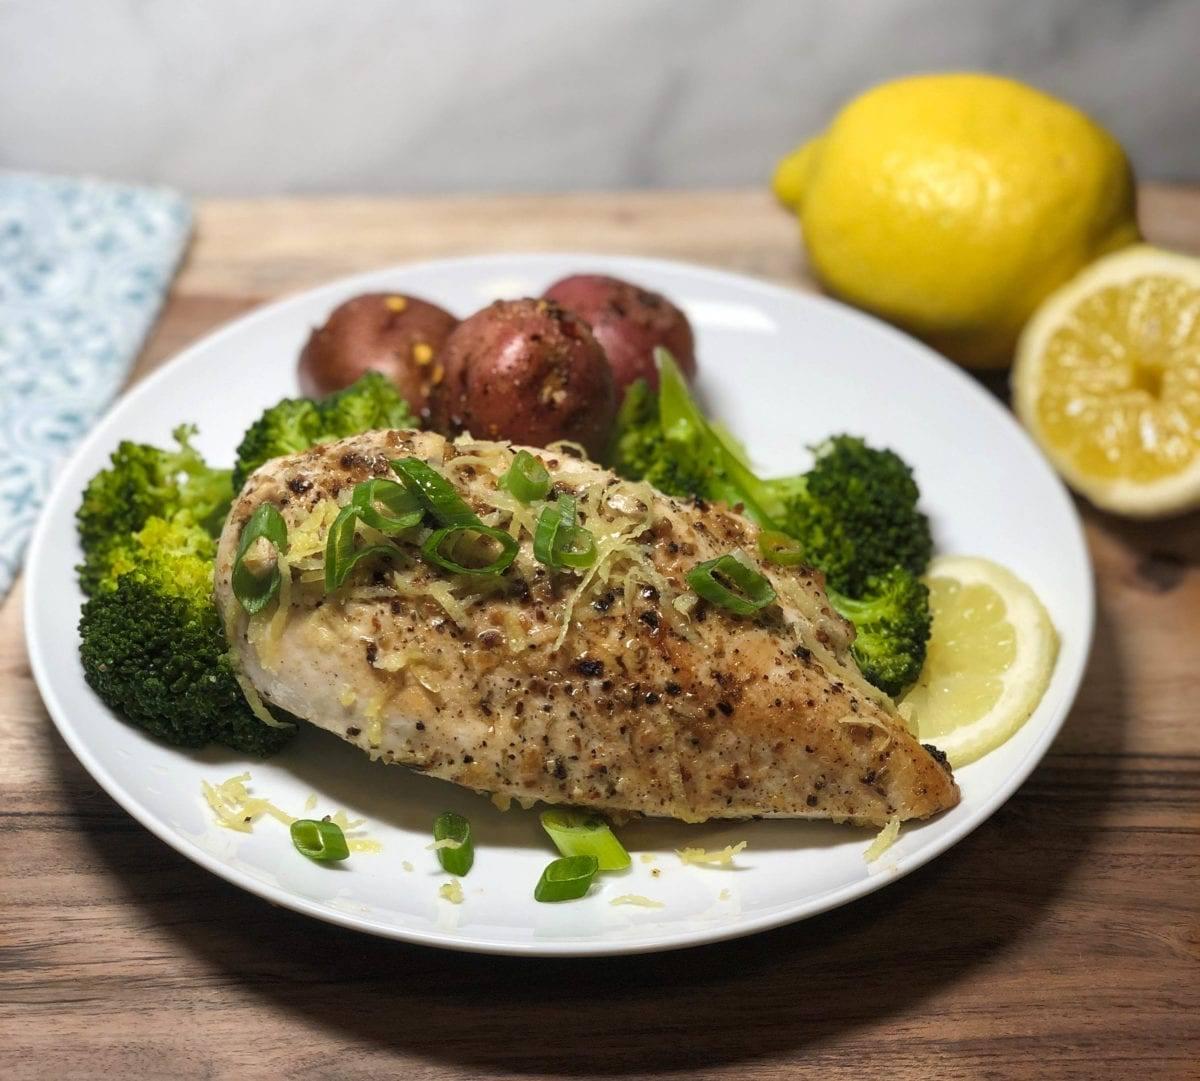 Lemon Chicken & Broccoli